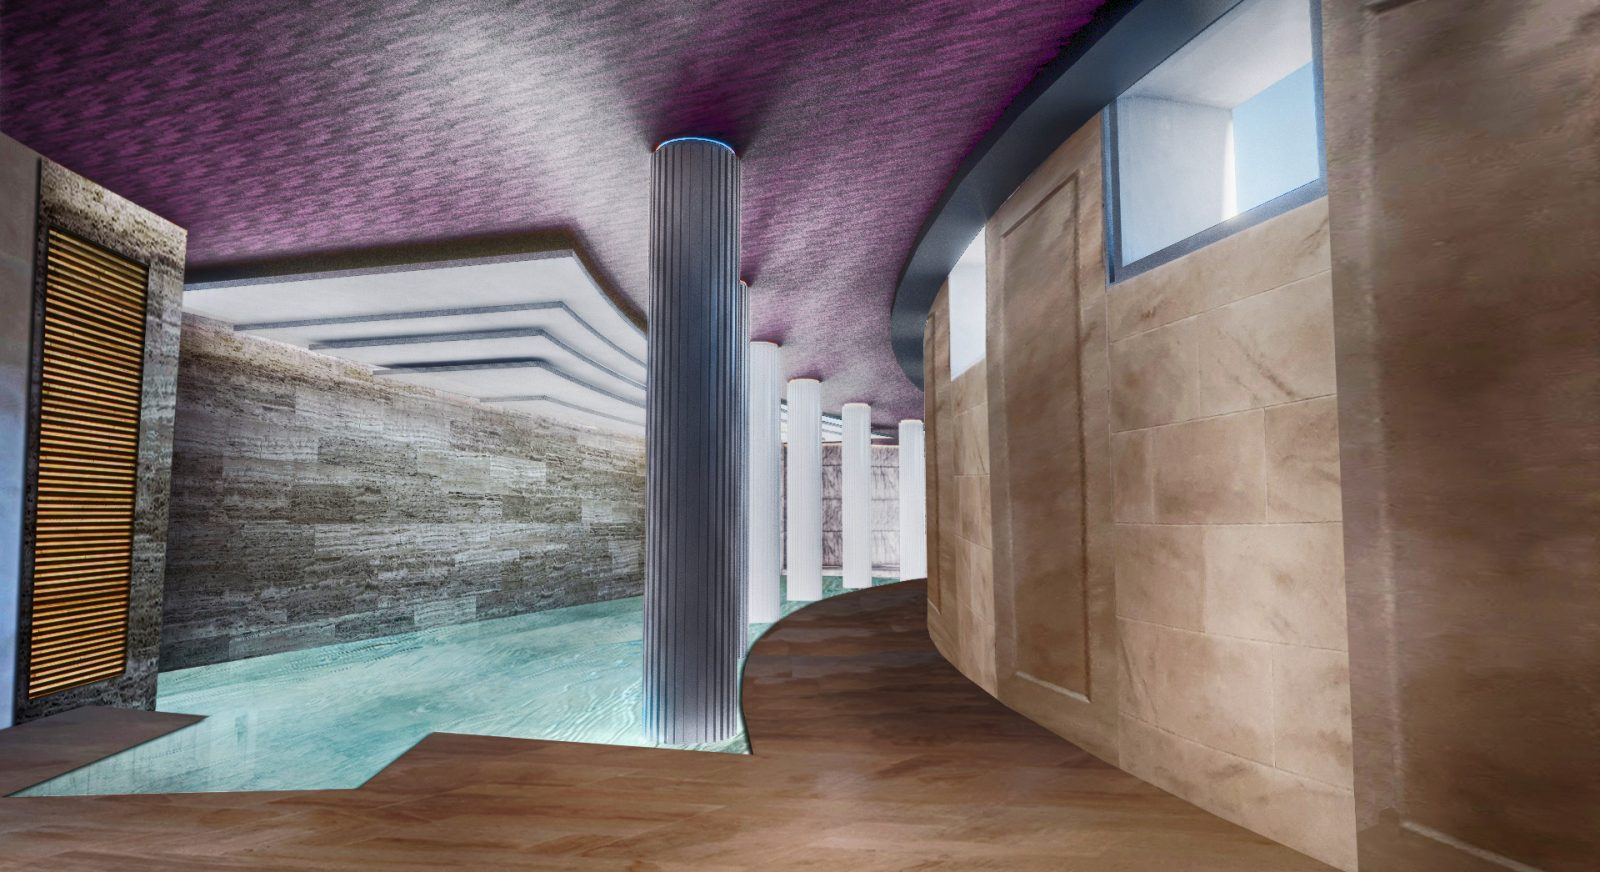 FT OSP modern basement swimming pool architecture architects jersey architects12